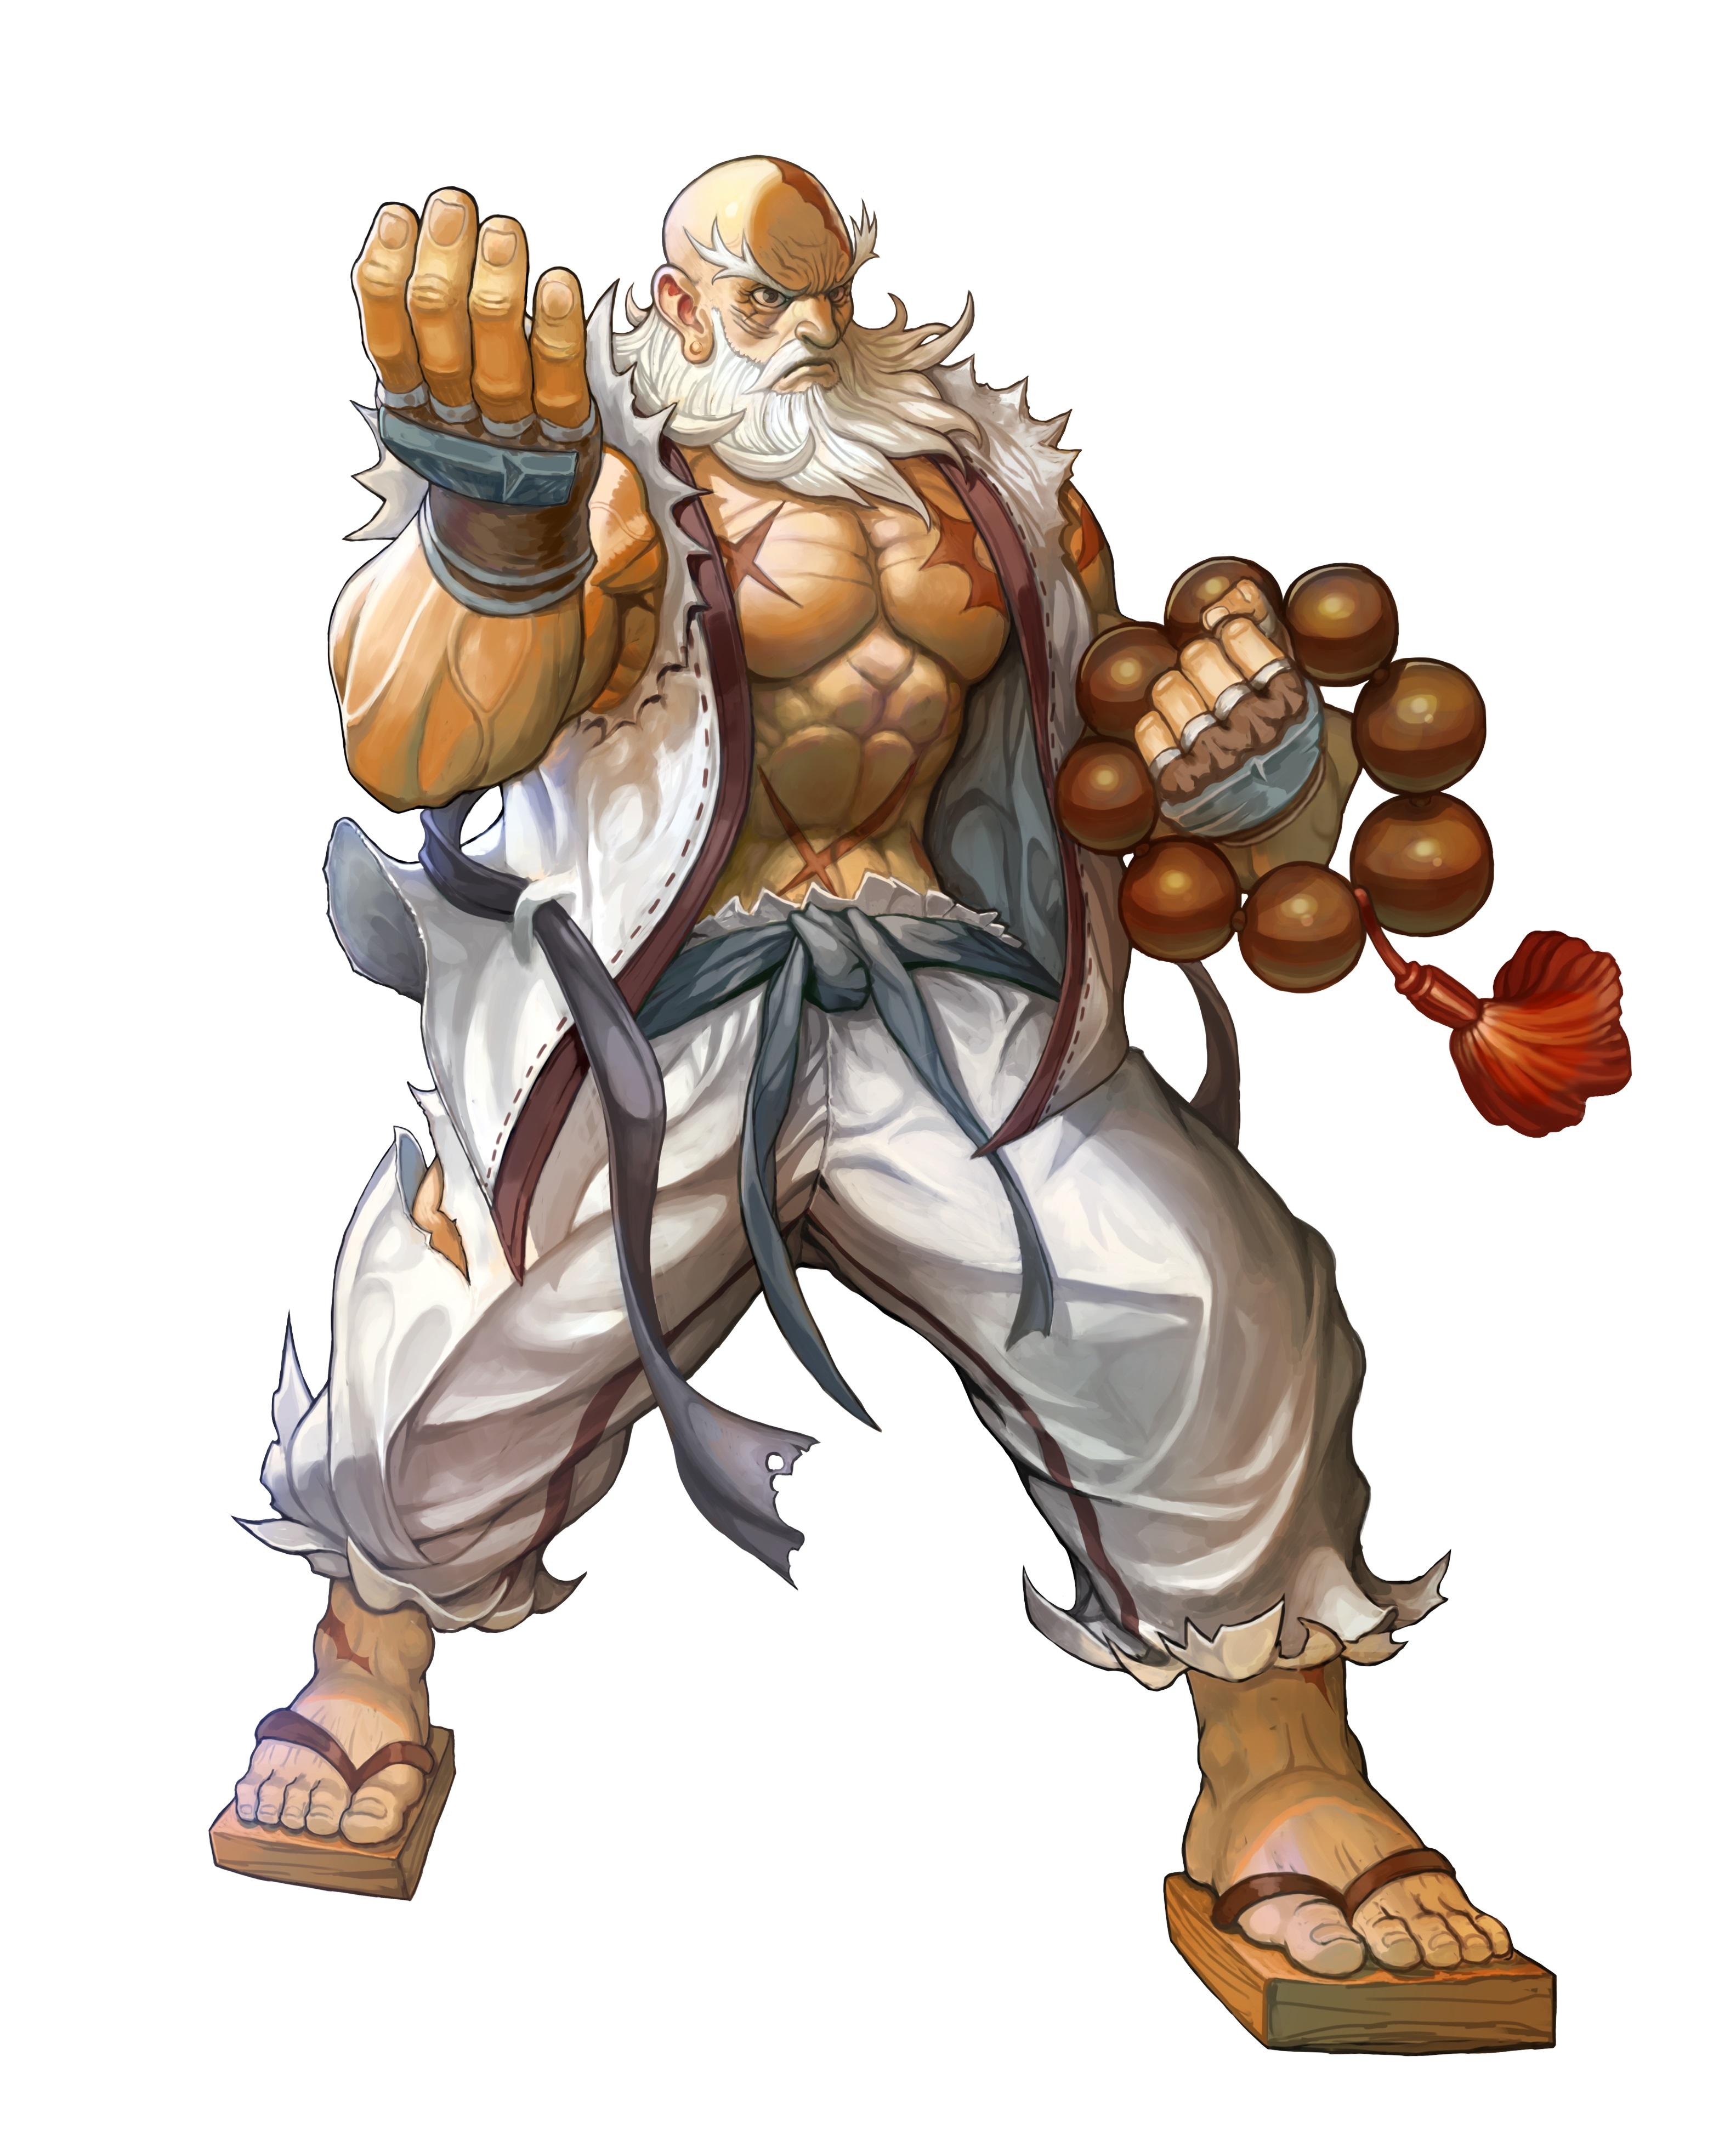 Grand Master Jehoon